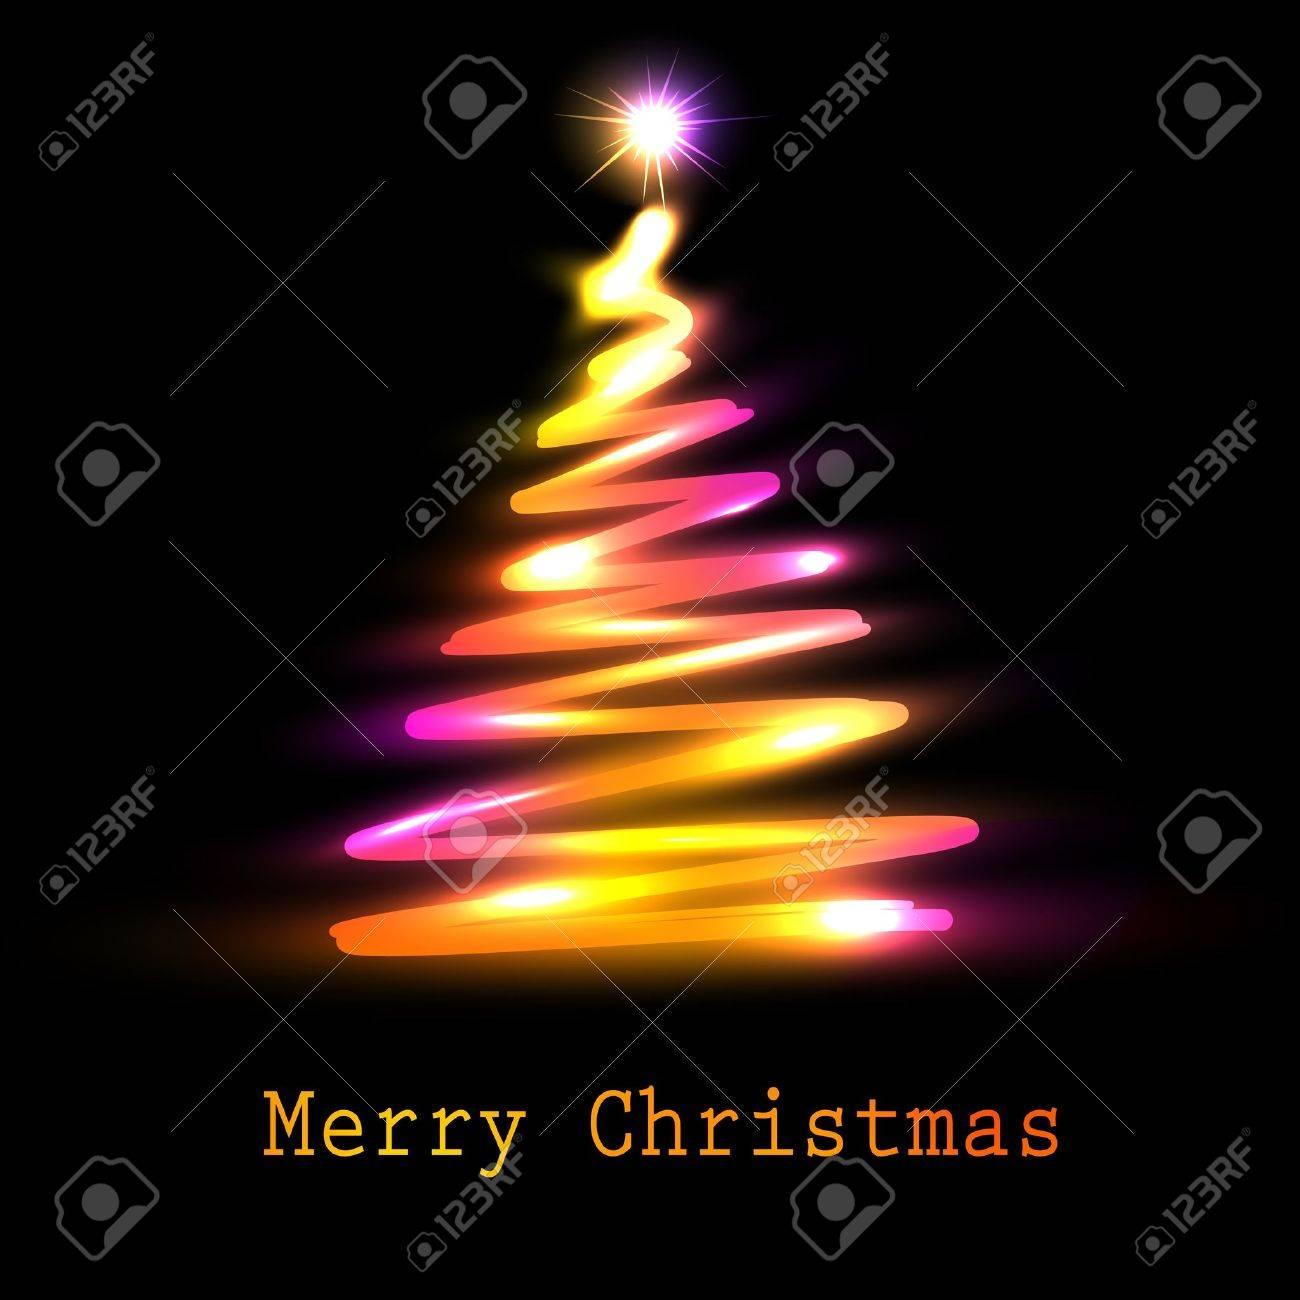 Christmas tree greeting card illustration Stock Vector - 11091395